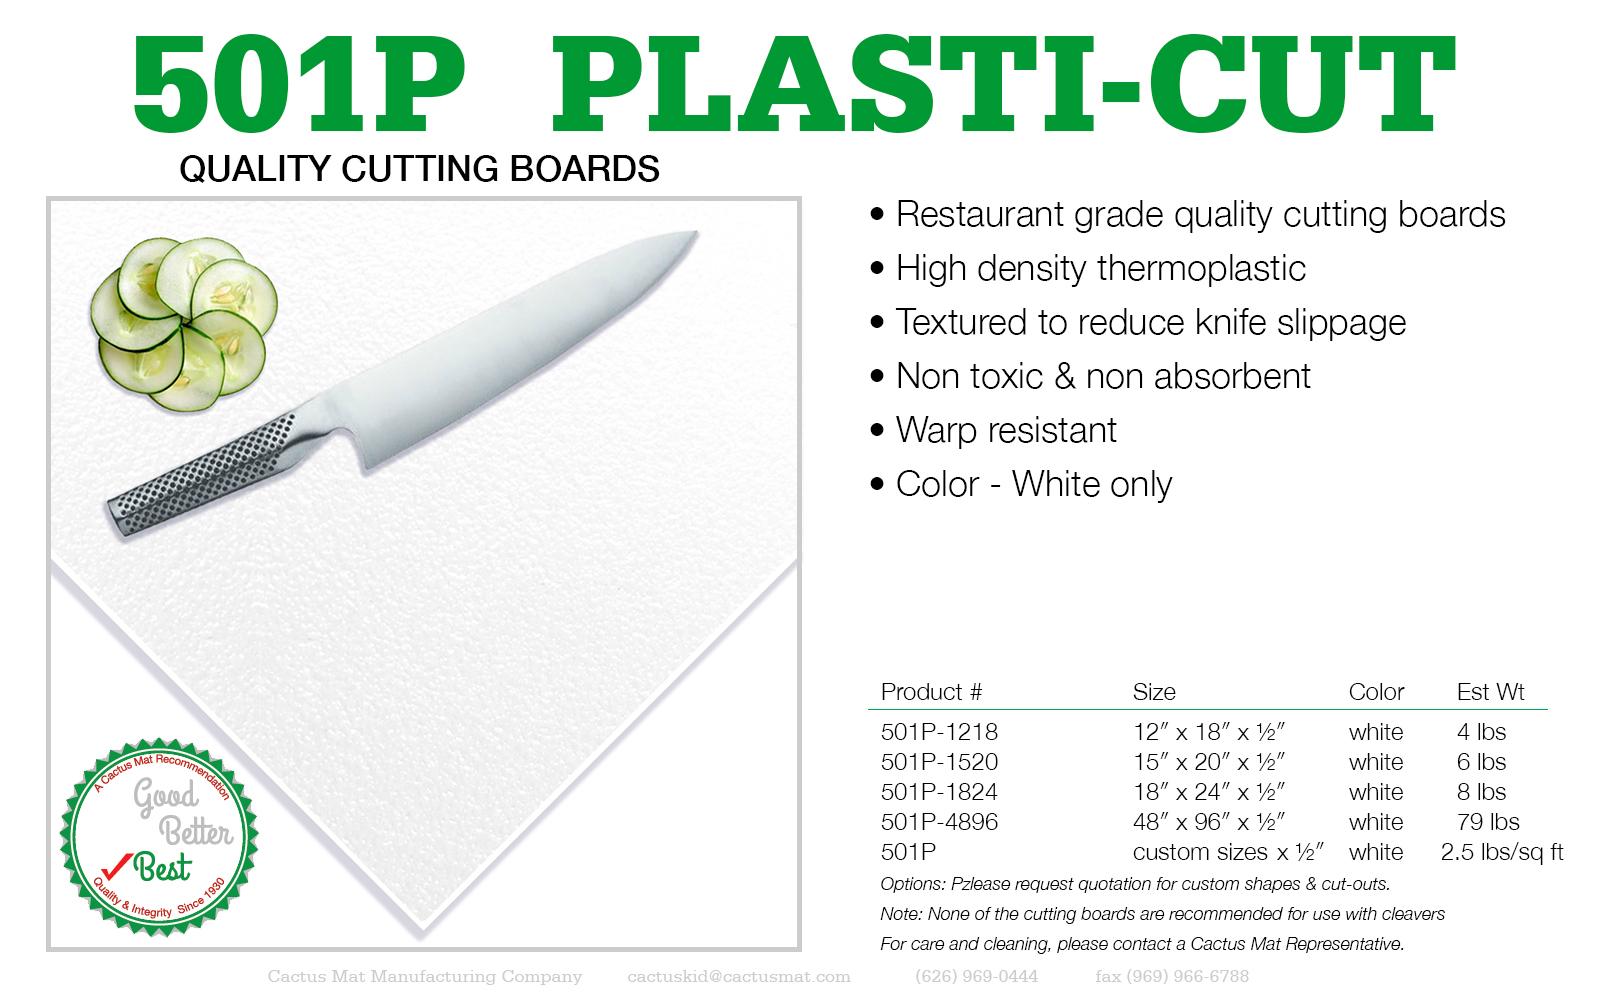 502P_Plasti-Cut_1600x1000.jpg